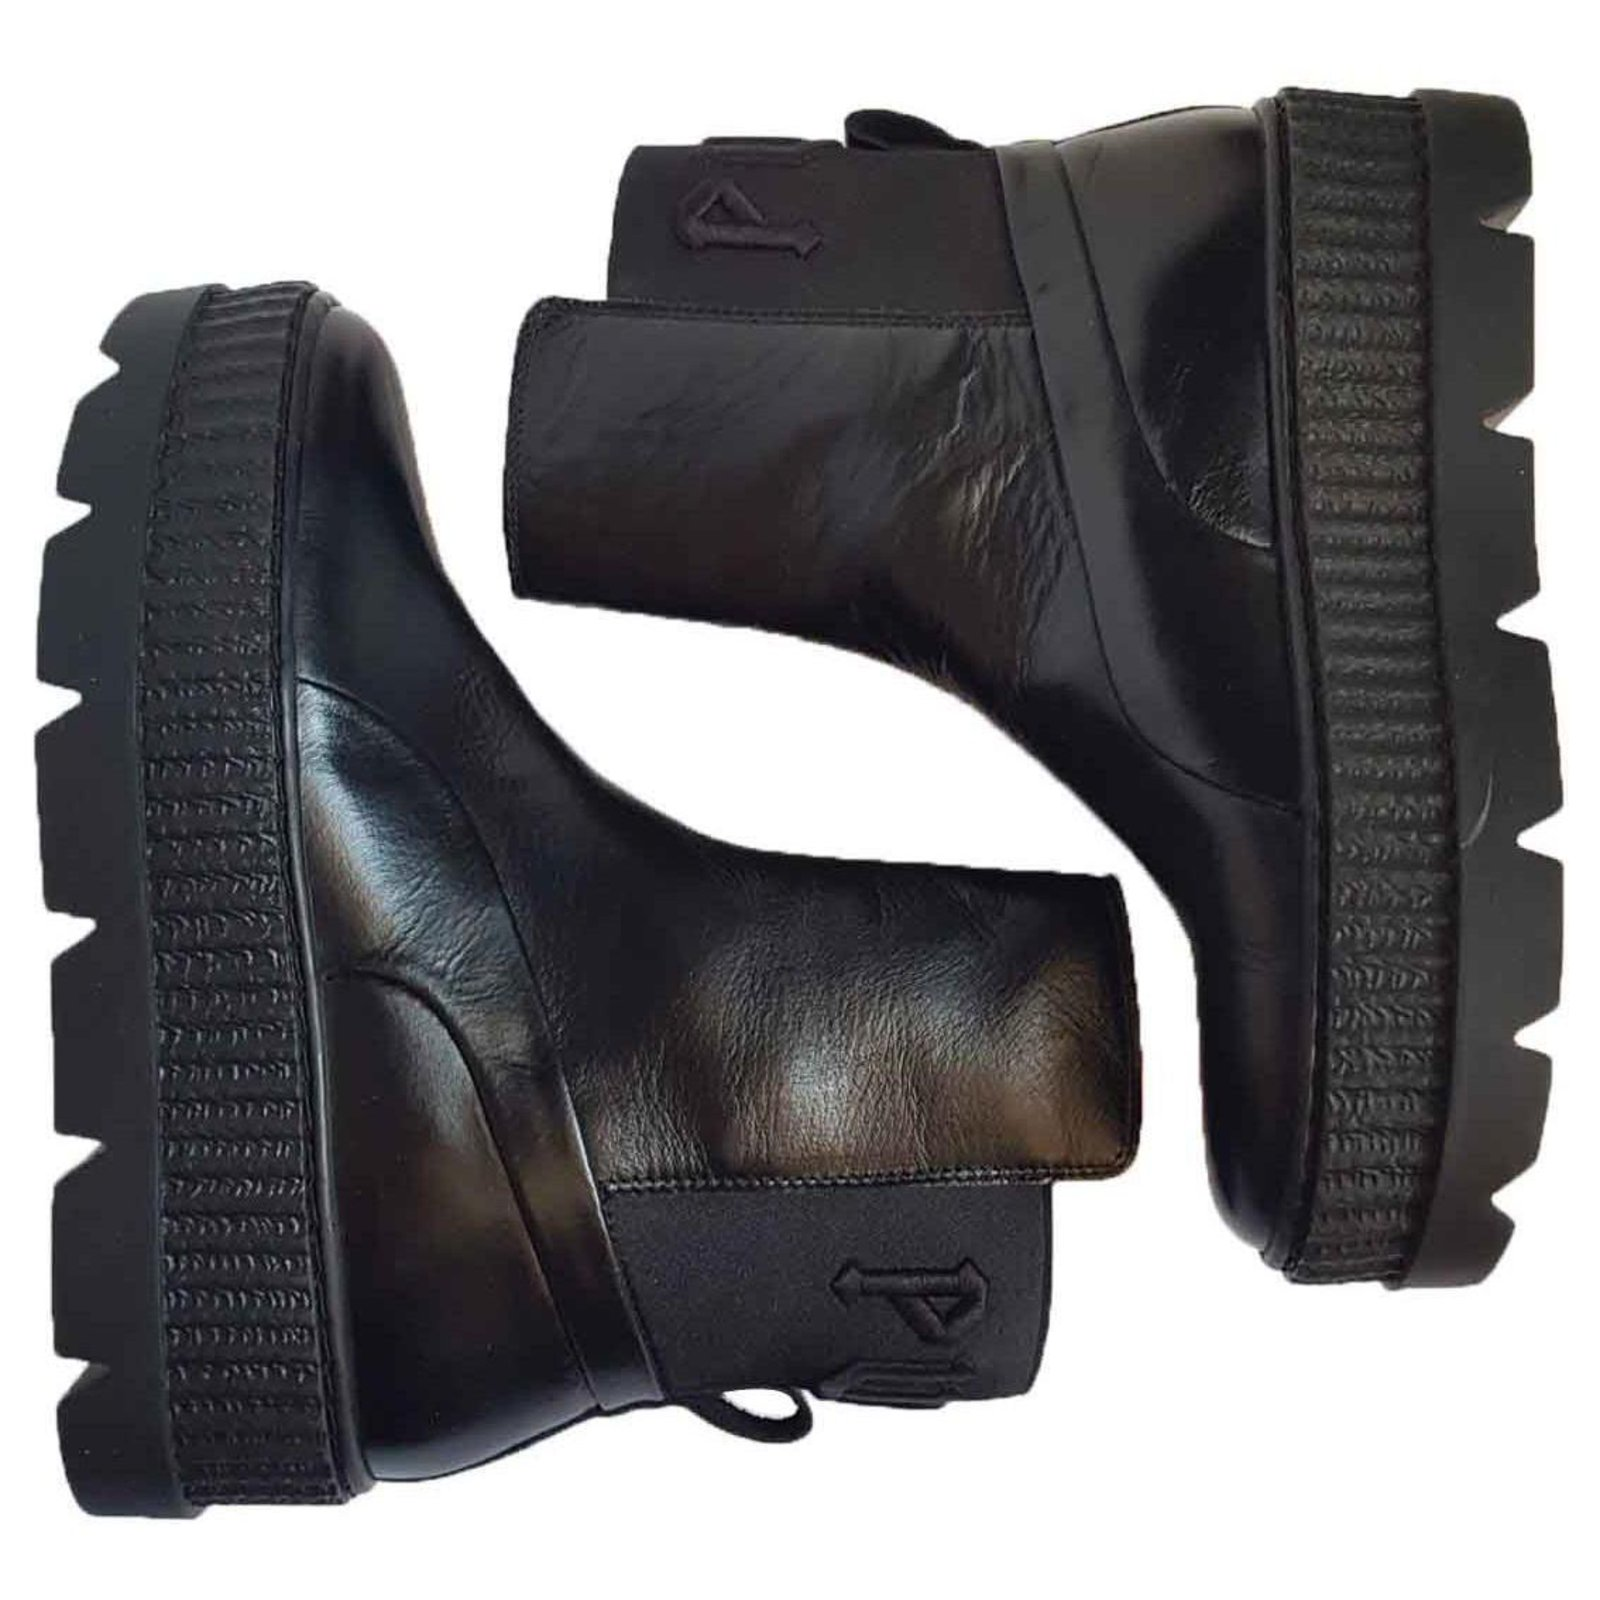 Ankle Boots Fenty x Puma by Rihanna